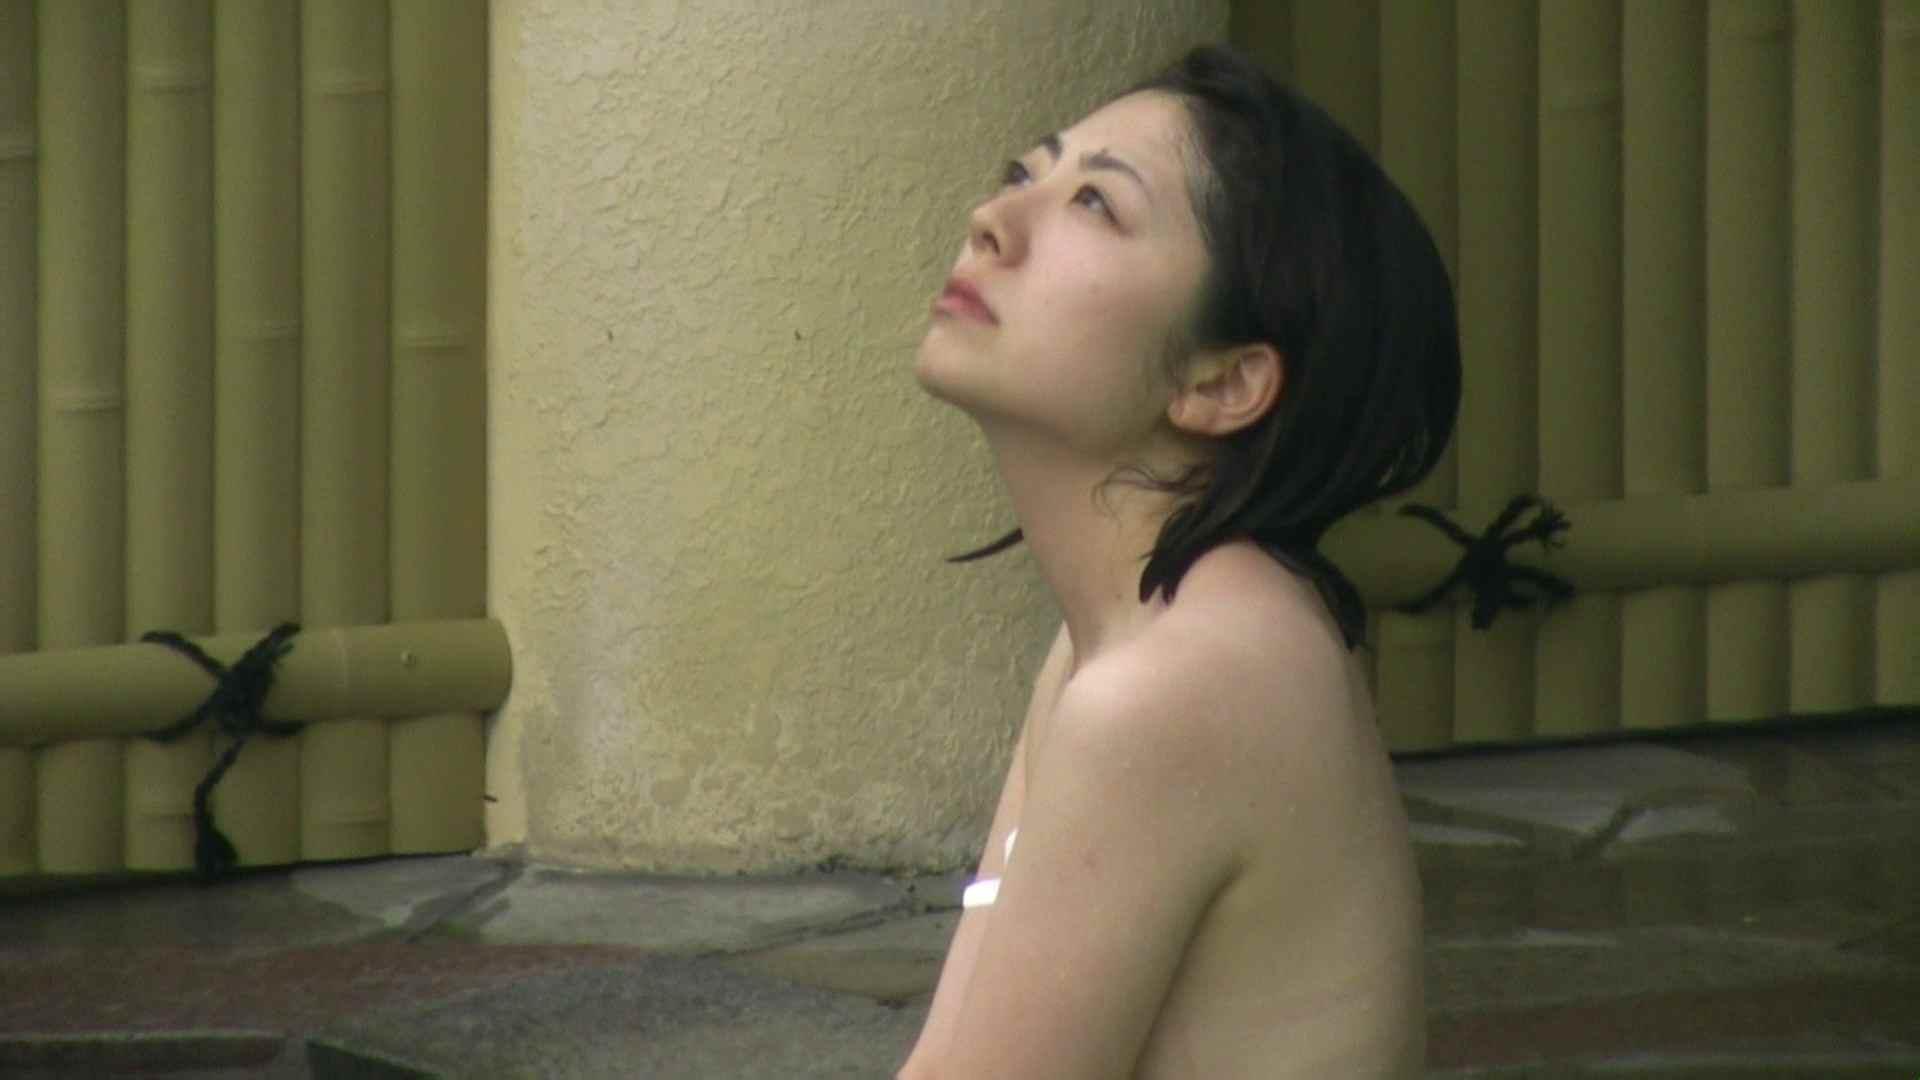 Aquaな露天風呂Vol.04 OLのプライベート 盗み撮り動画キャプチャ 10pic 2